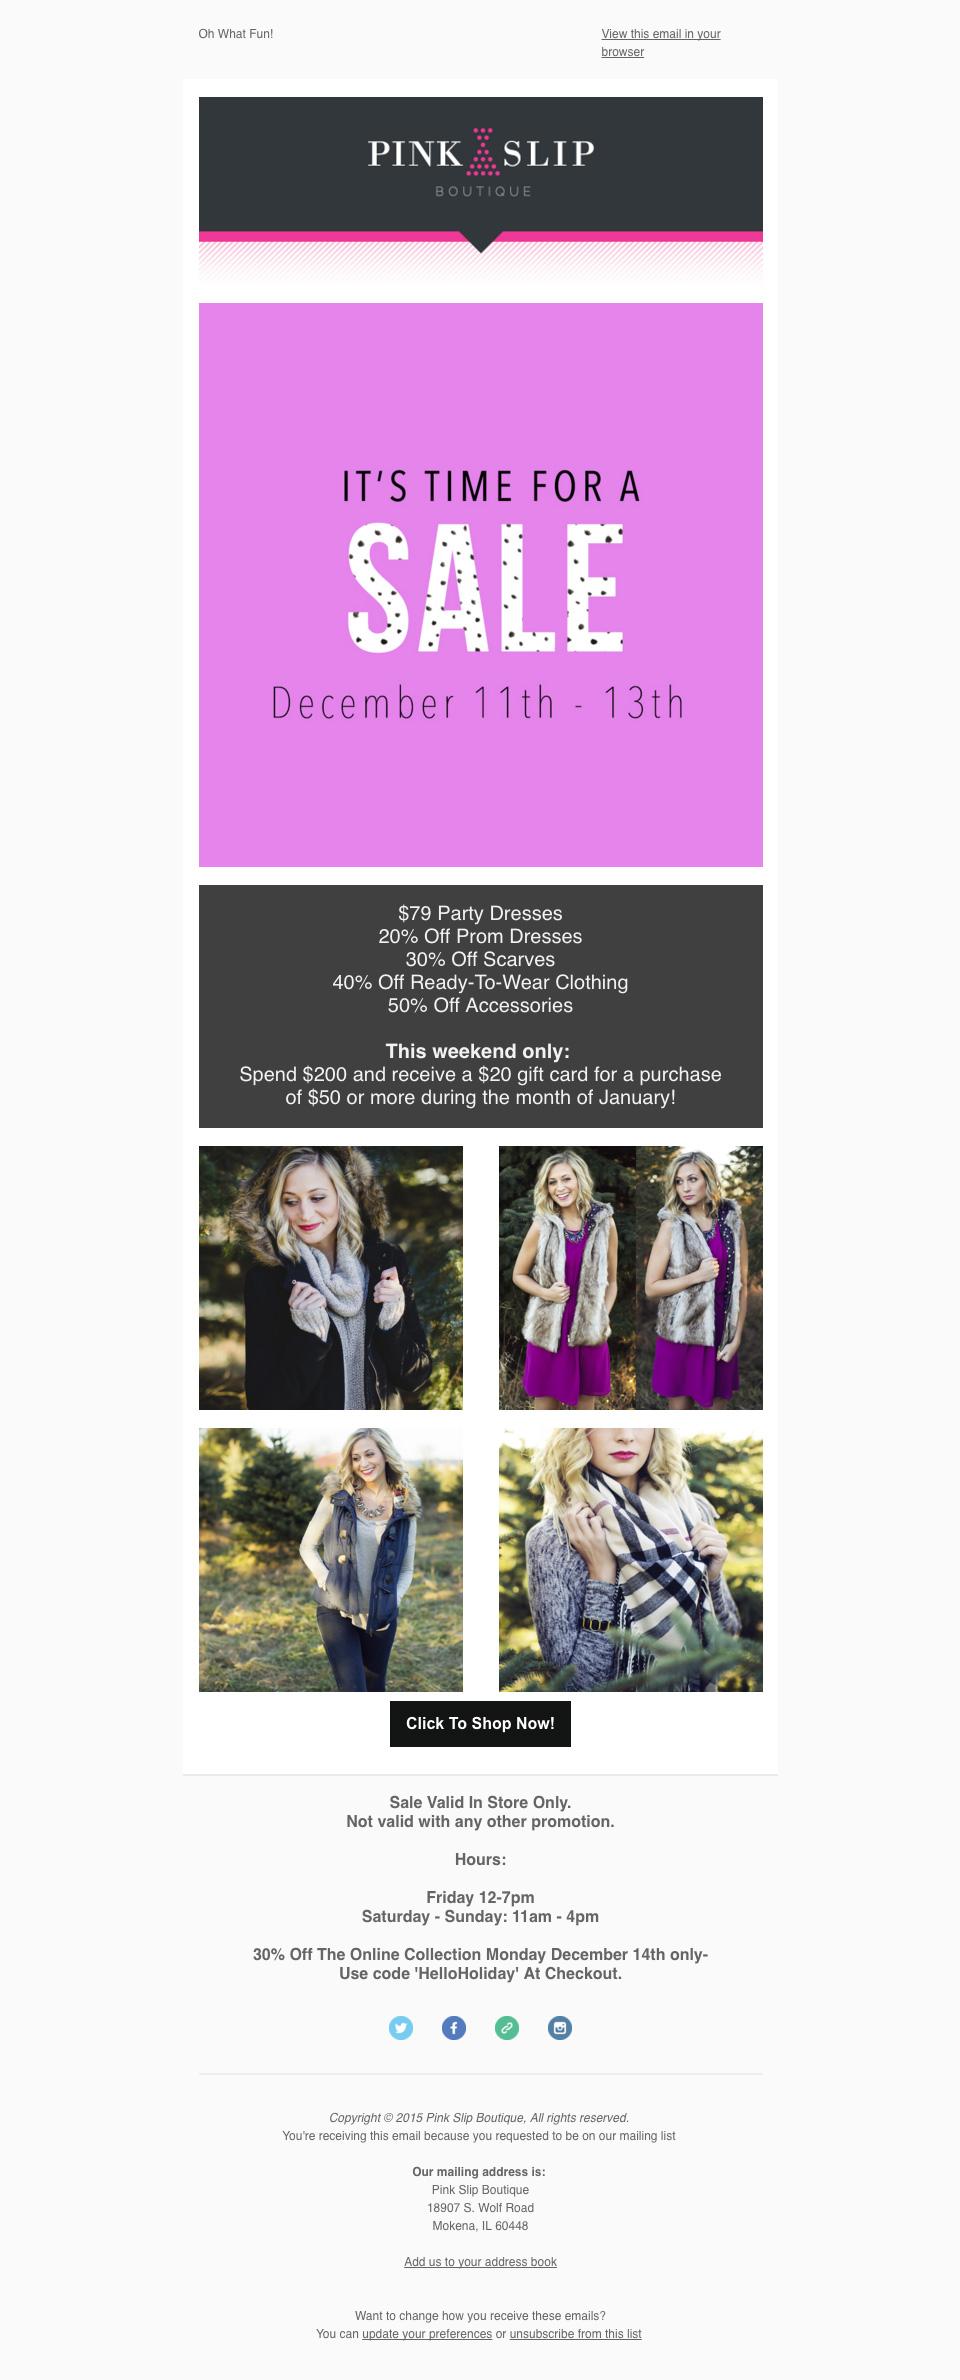 pink-slip-boutique-newsletter